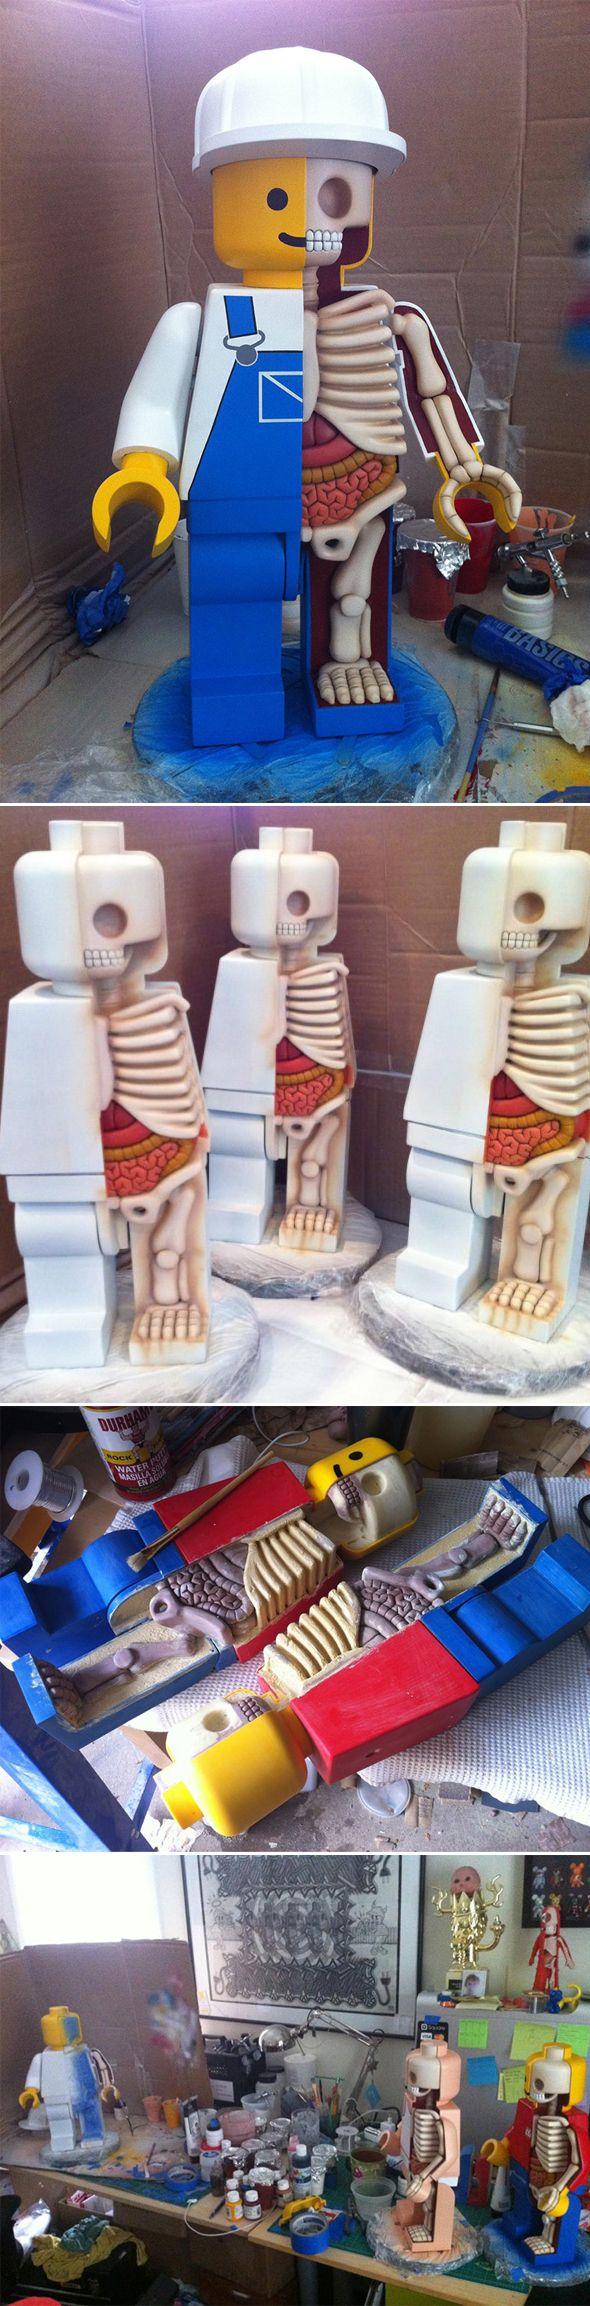 LEGO-dissection-par-Jason-Freeny-2